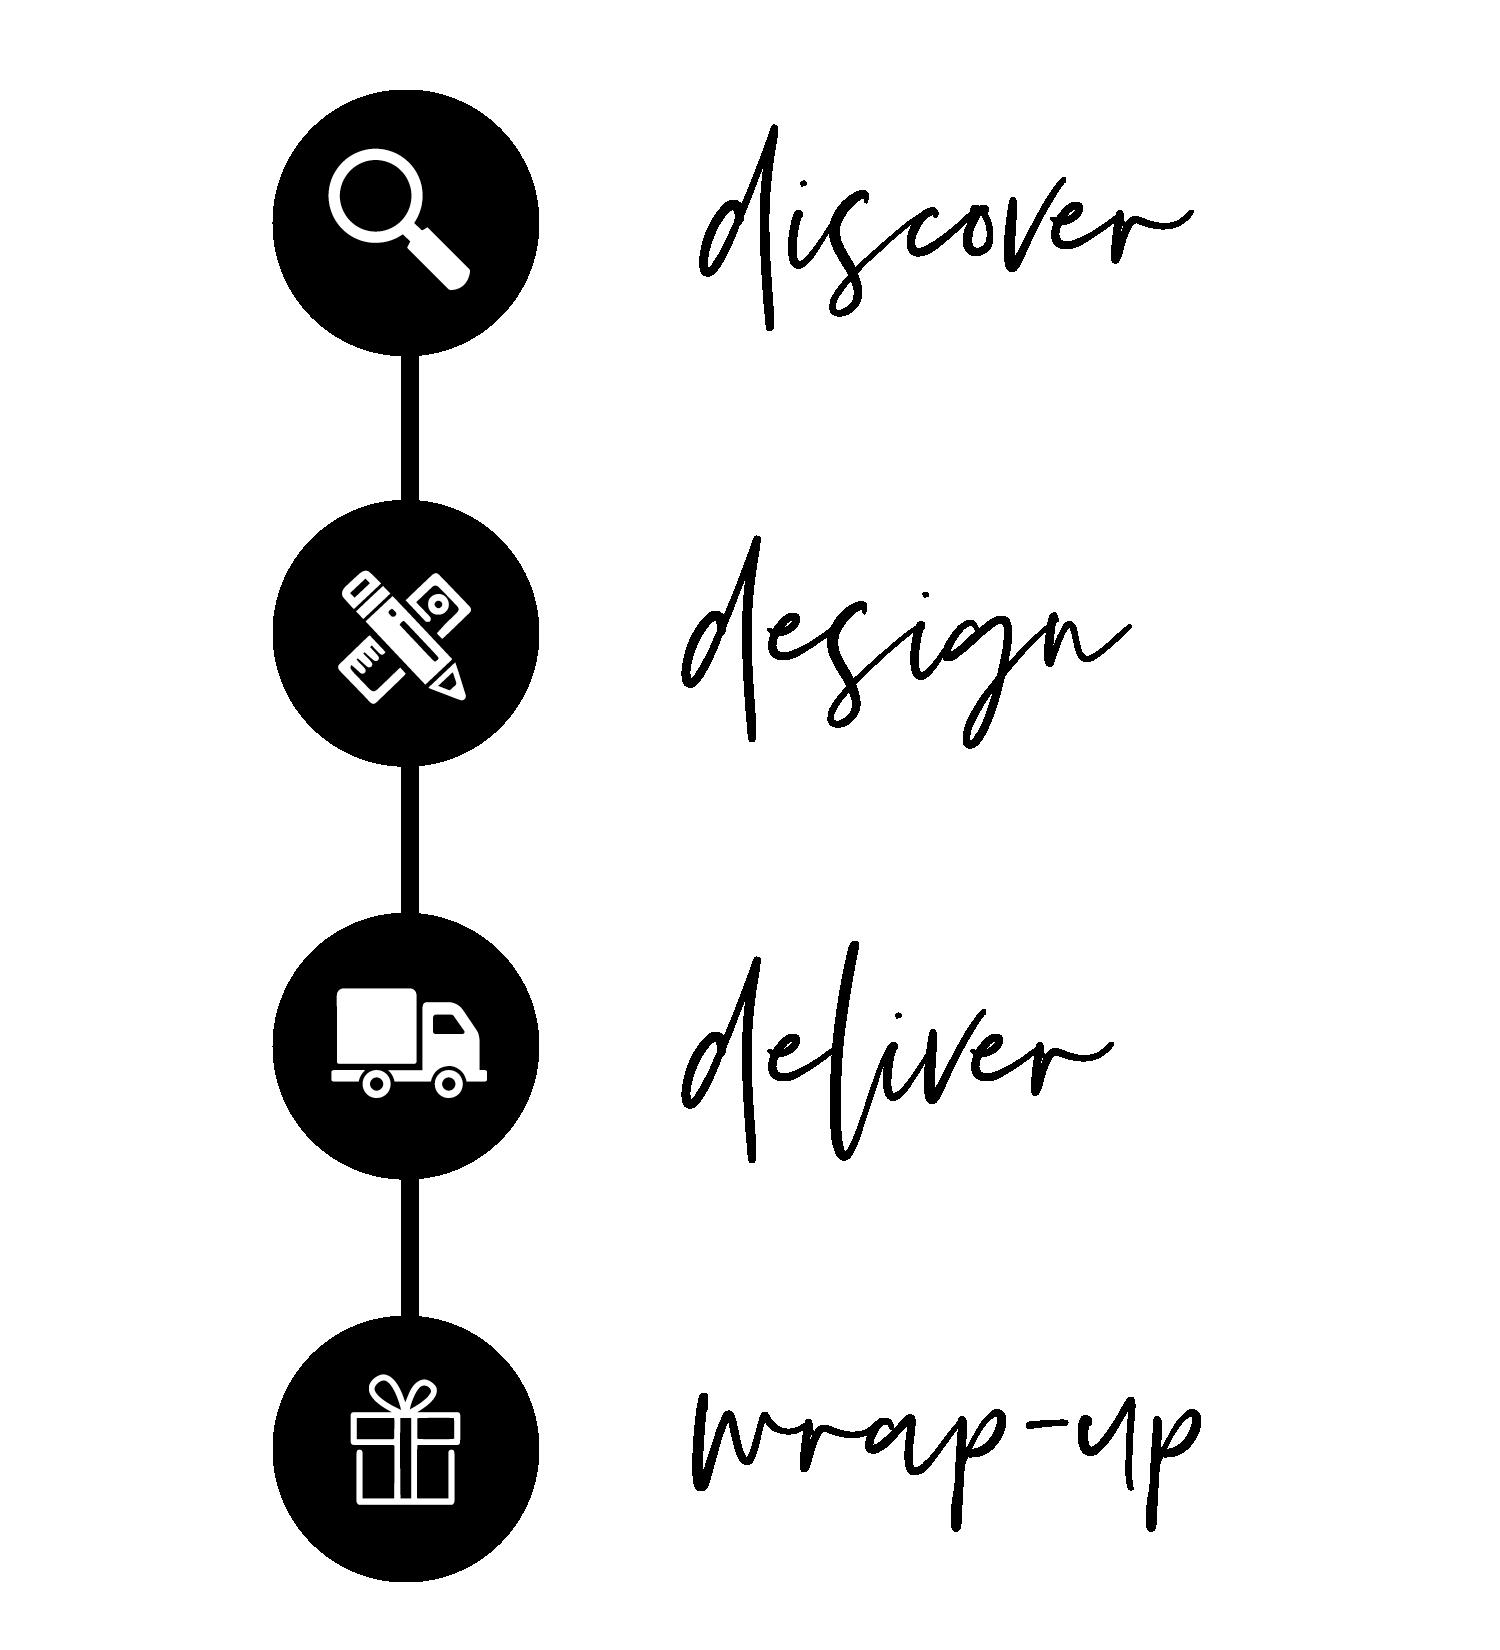 FullServiceInterior_DesignProcess_rev.png